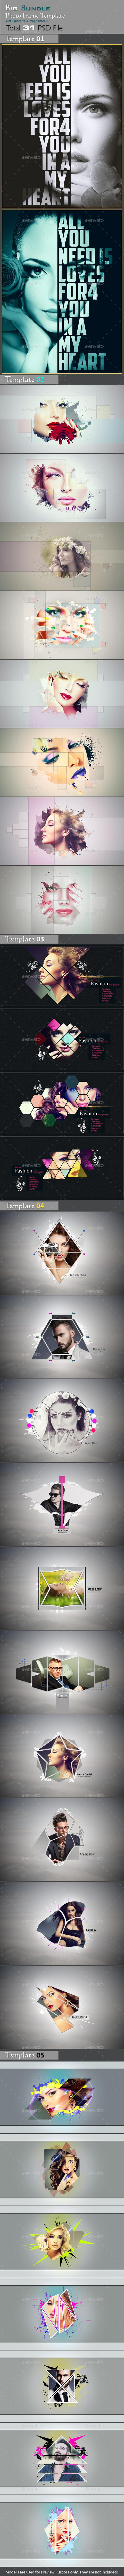 Big Bundle - Photo Templates Graphics